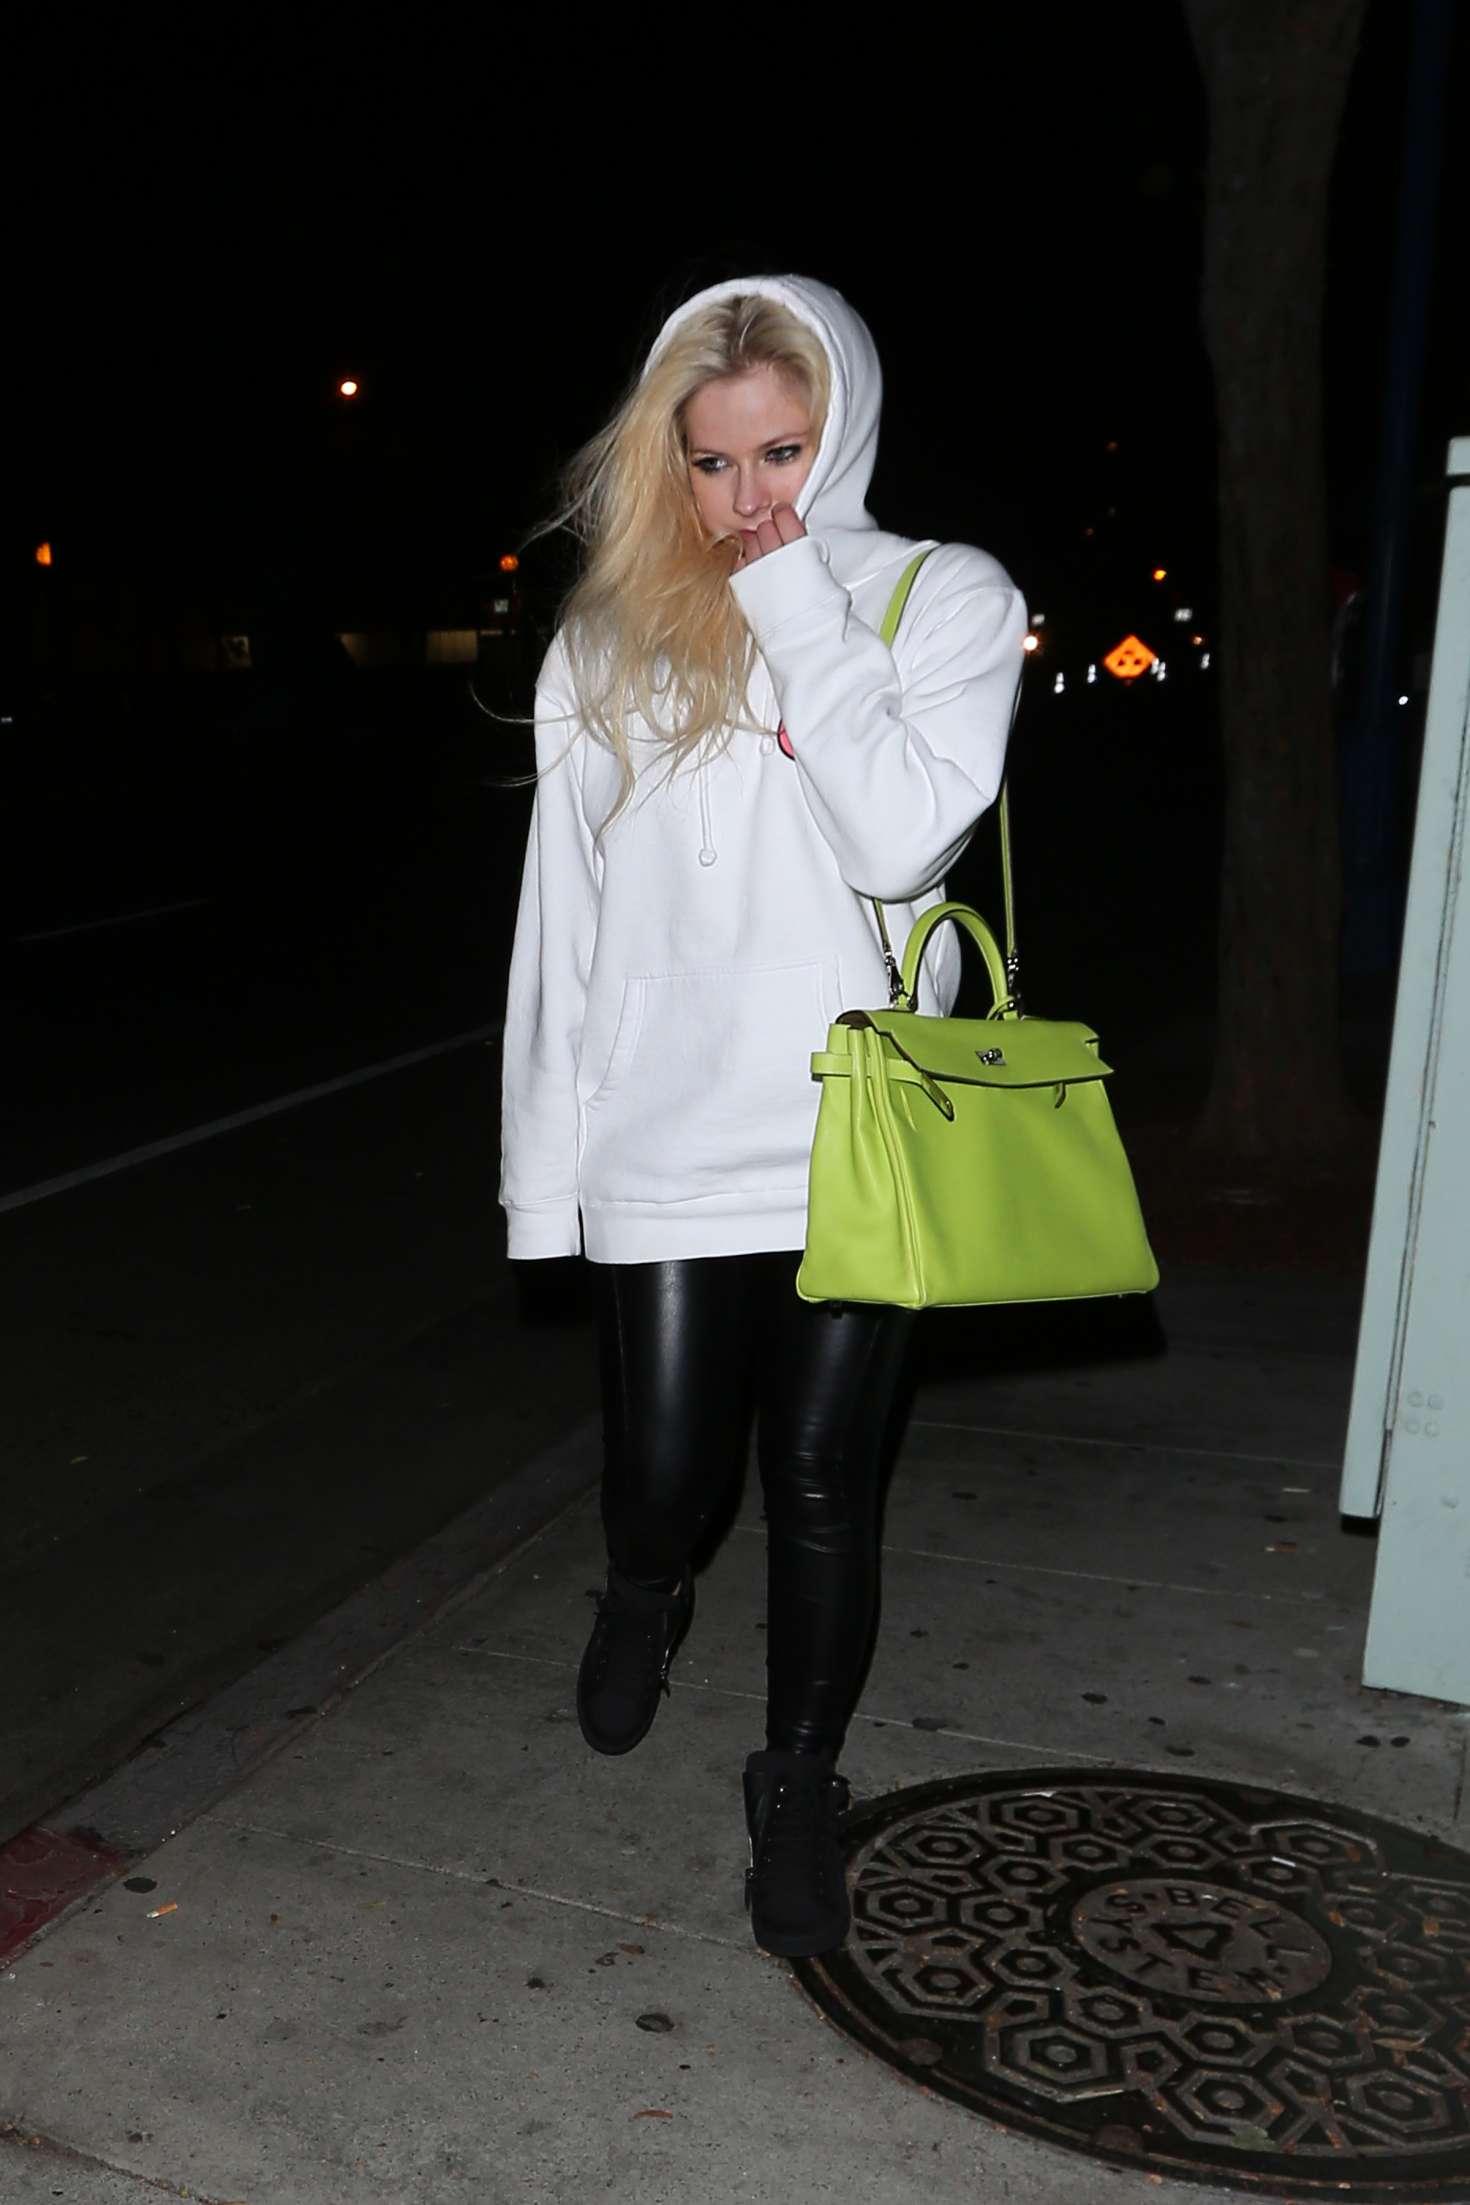 Avril Lavigne at Dan Tana's restaurant in West Hollywood